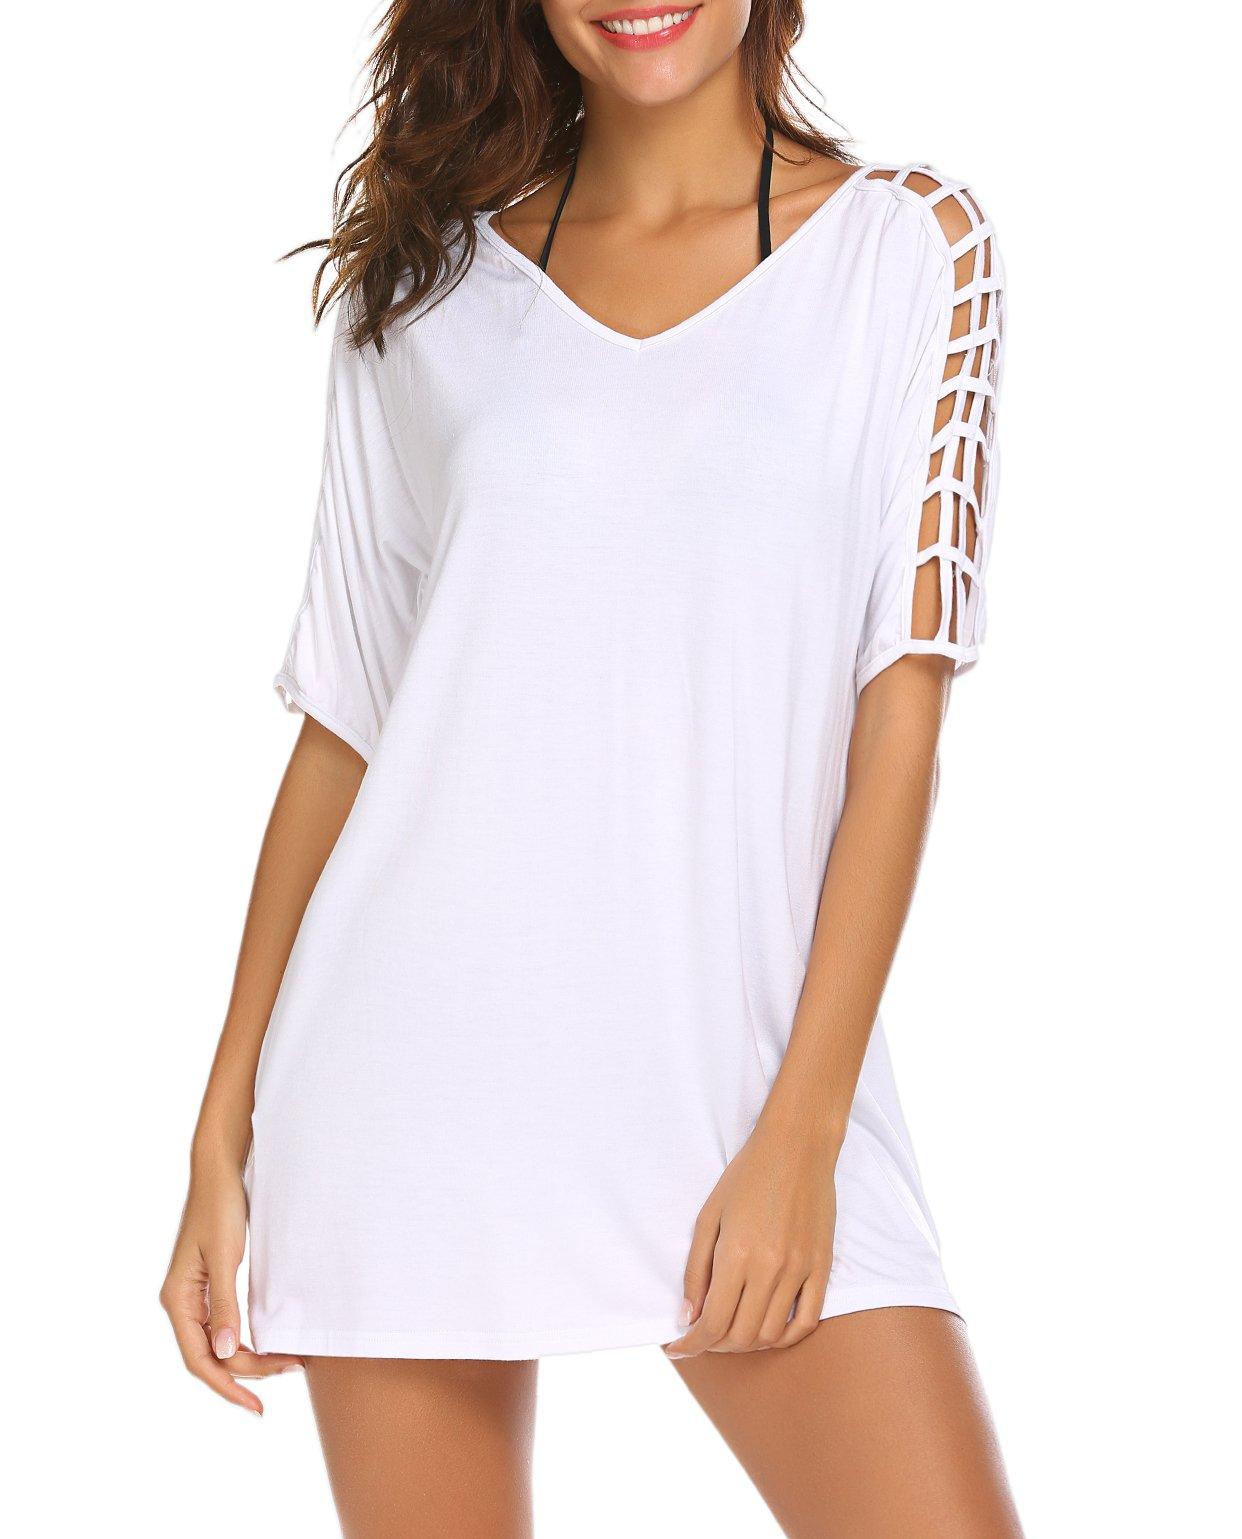 SimpleFun Womens Baggy Swimwear Bikini Cover up Beach Dress T-Shirt (White,S)